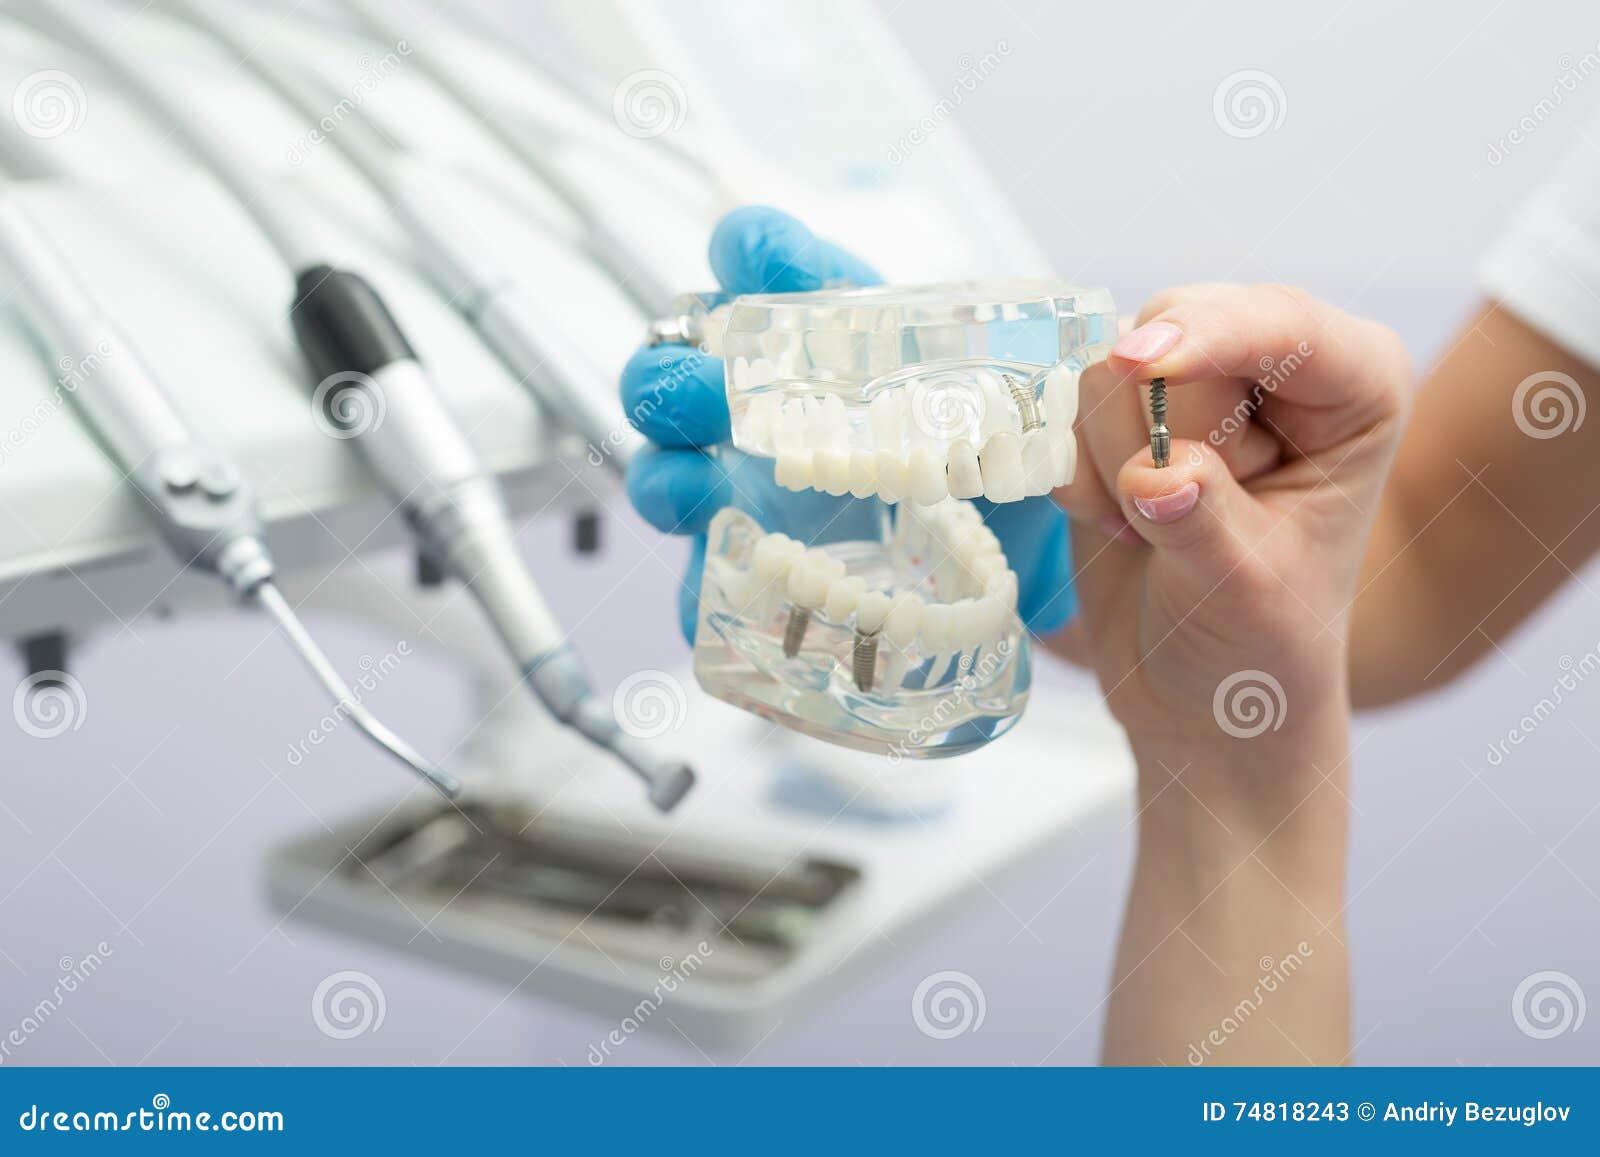 Implant teeth model